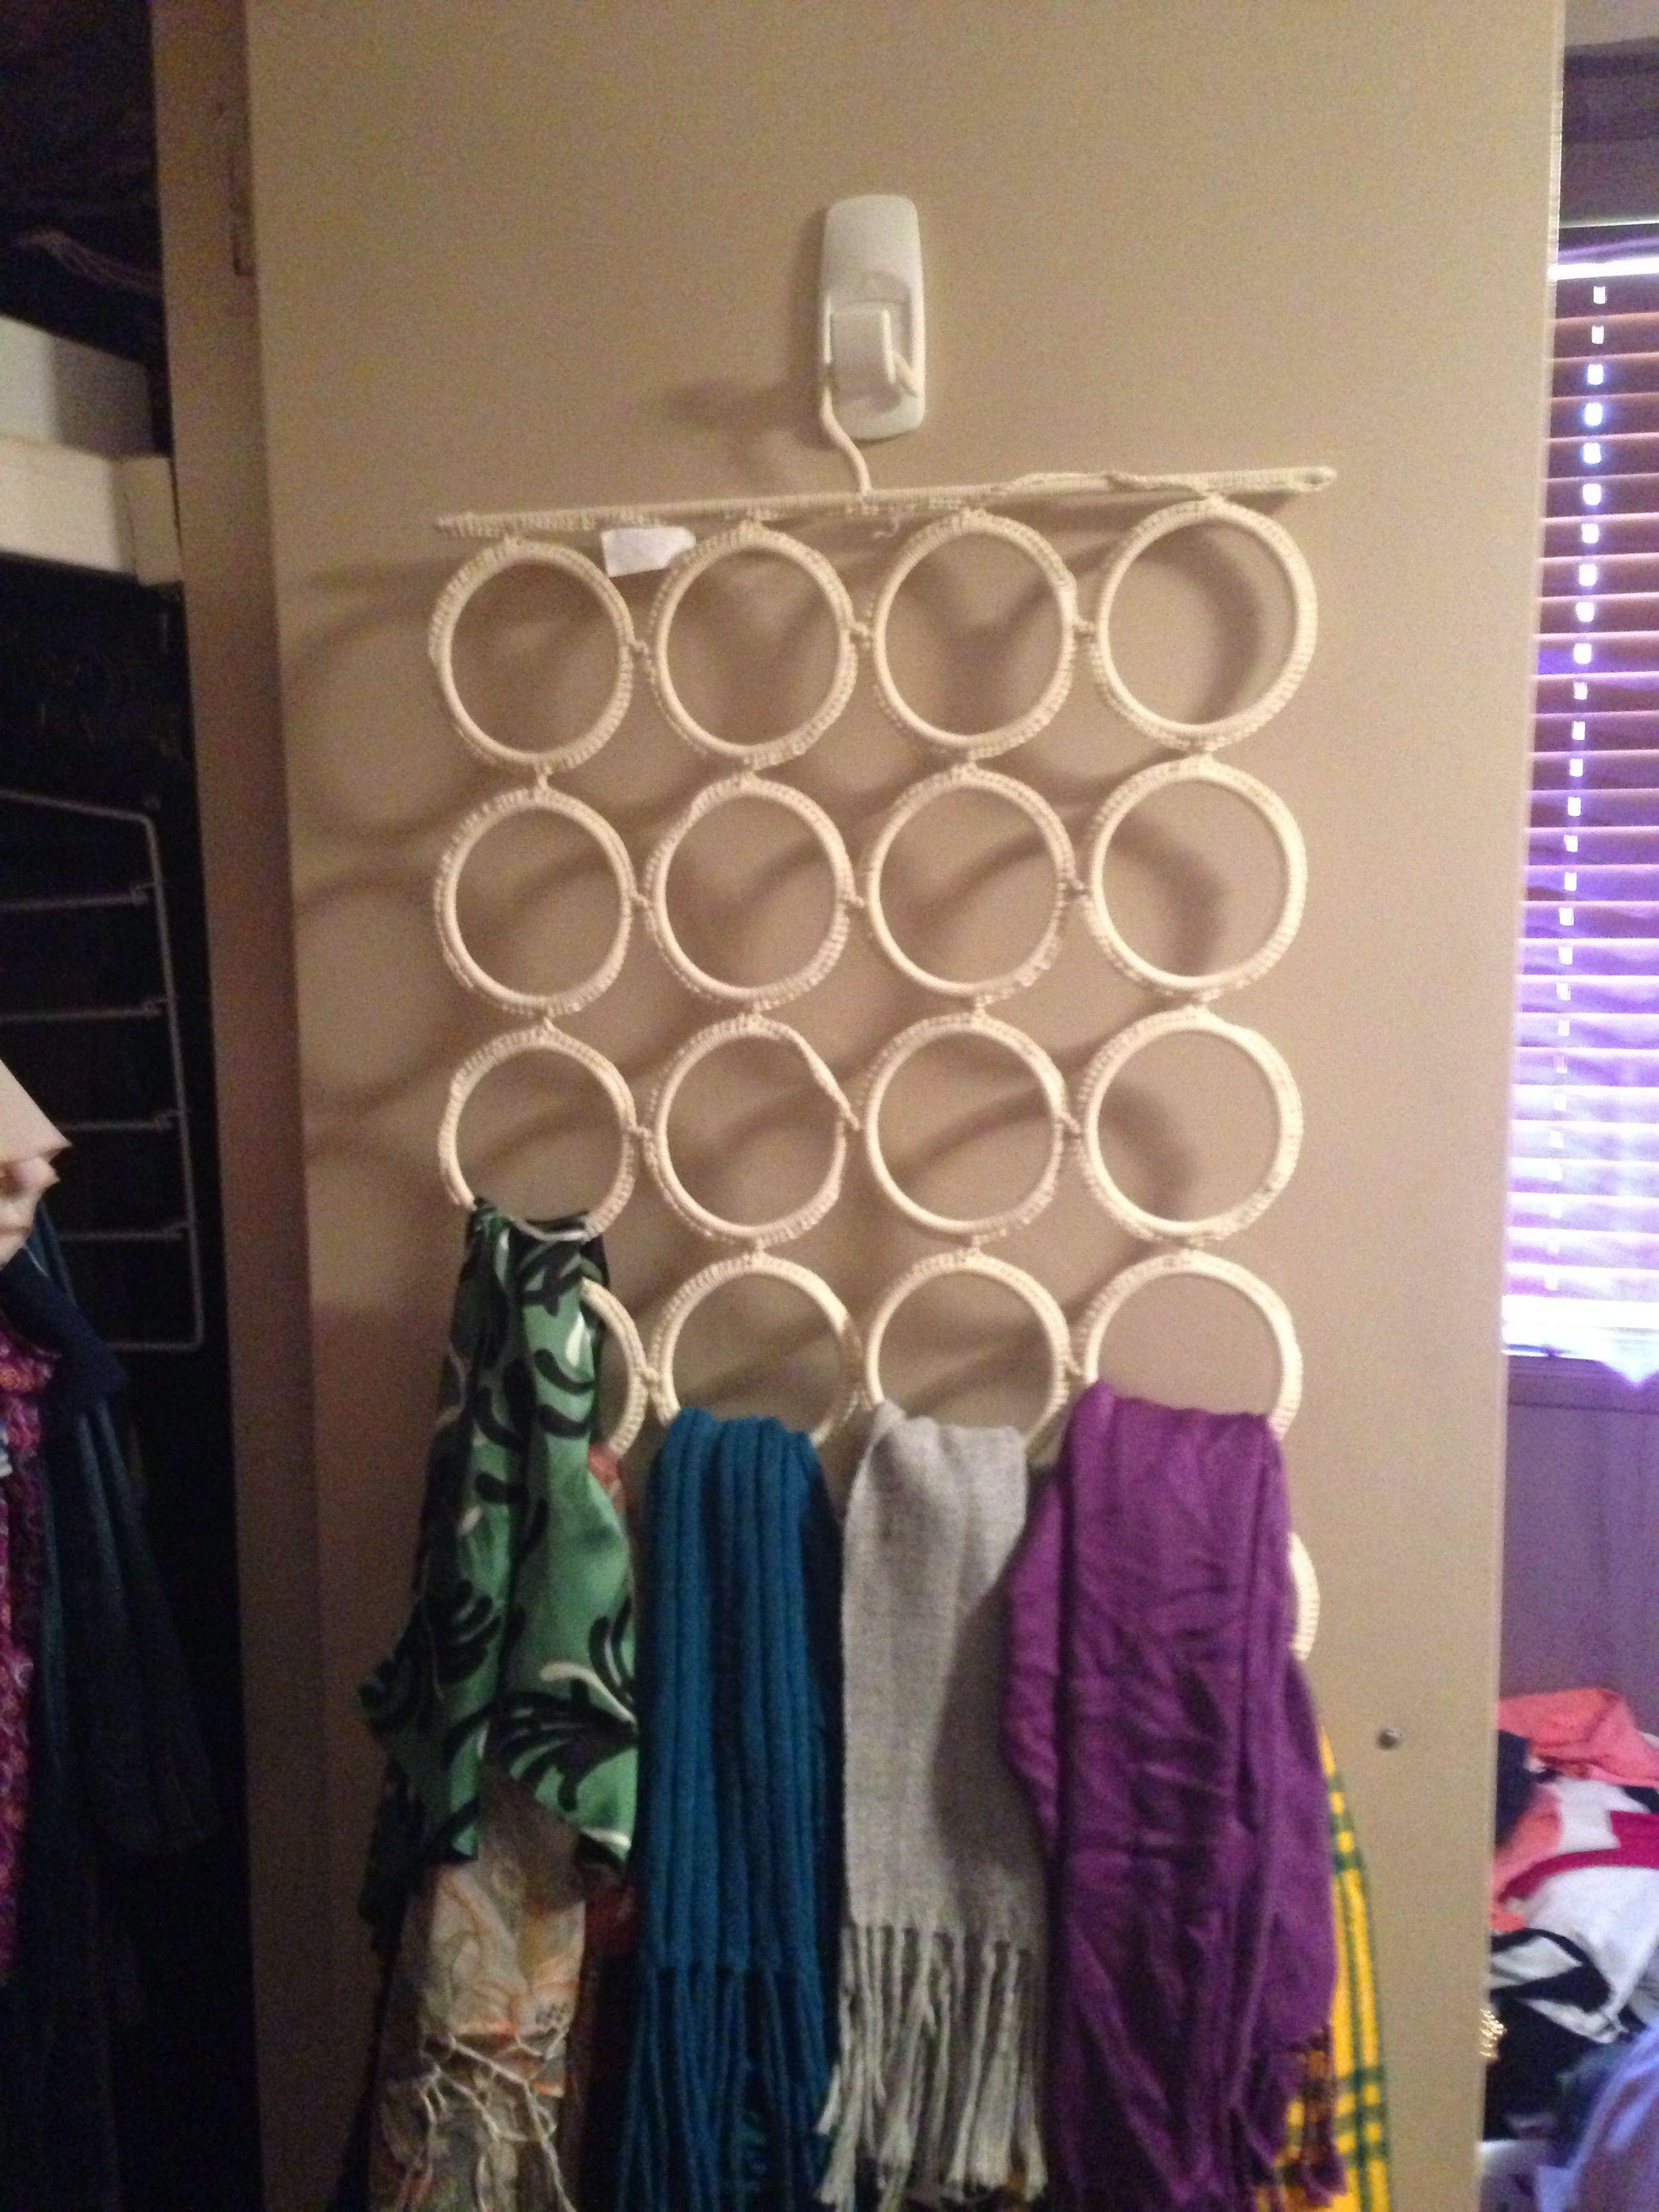 Cool scarf storage ideas on pinterest scarf storage for Scarves hanger ikea